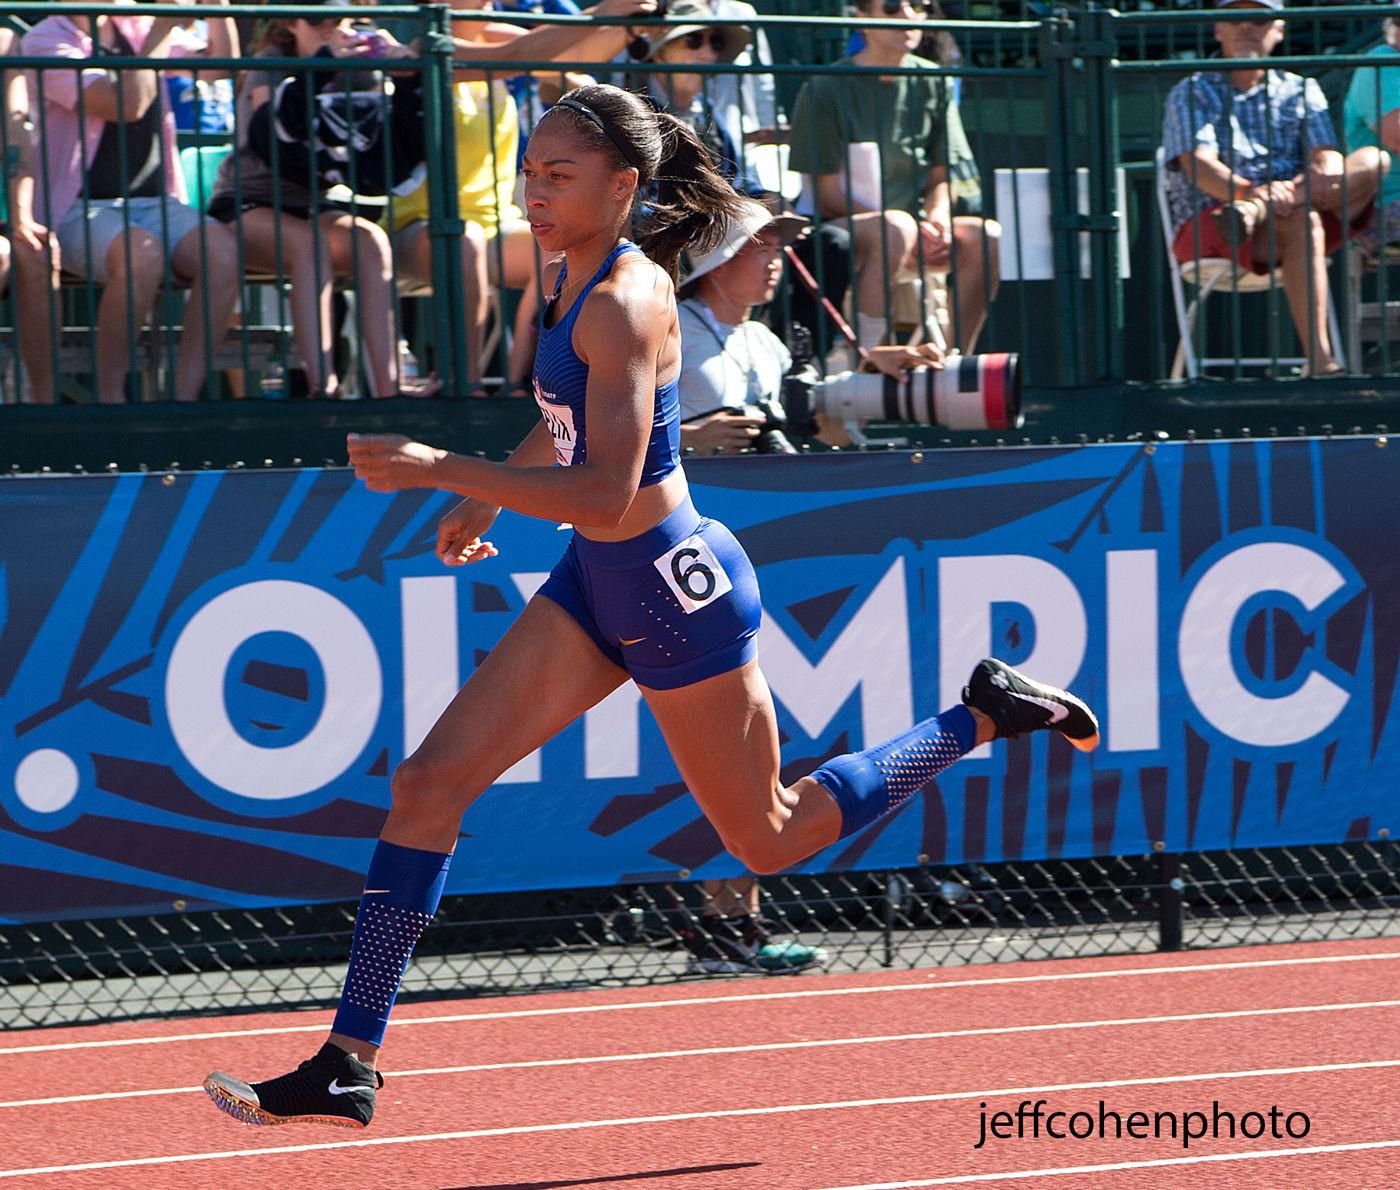 1r2016_oly_trials_day_3_a_felix_400m_run_jeff_cohen_photo_12029_web.jpg